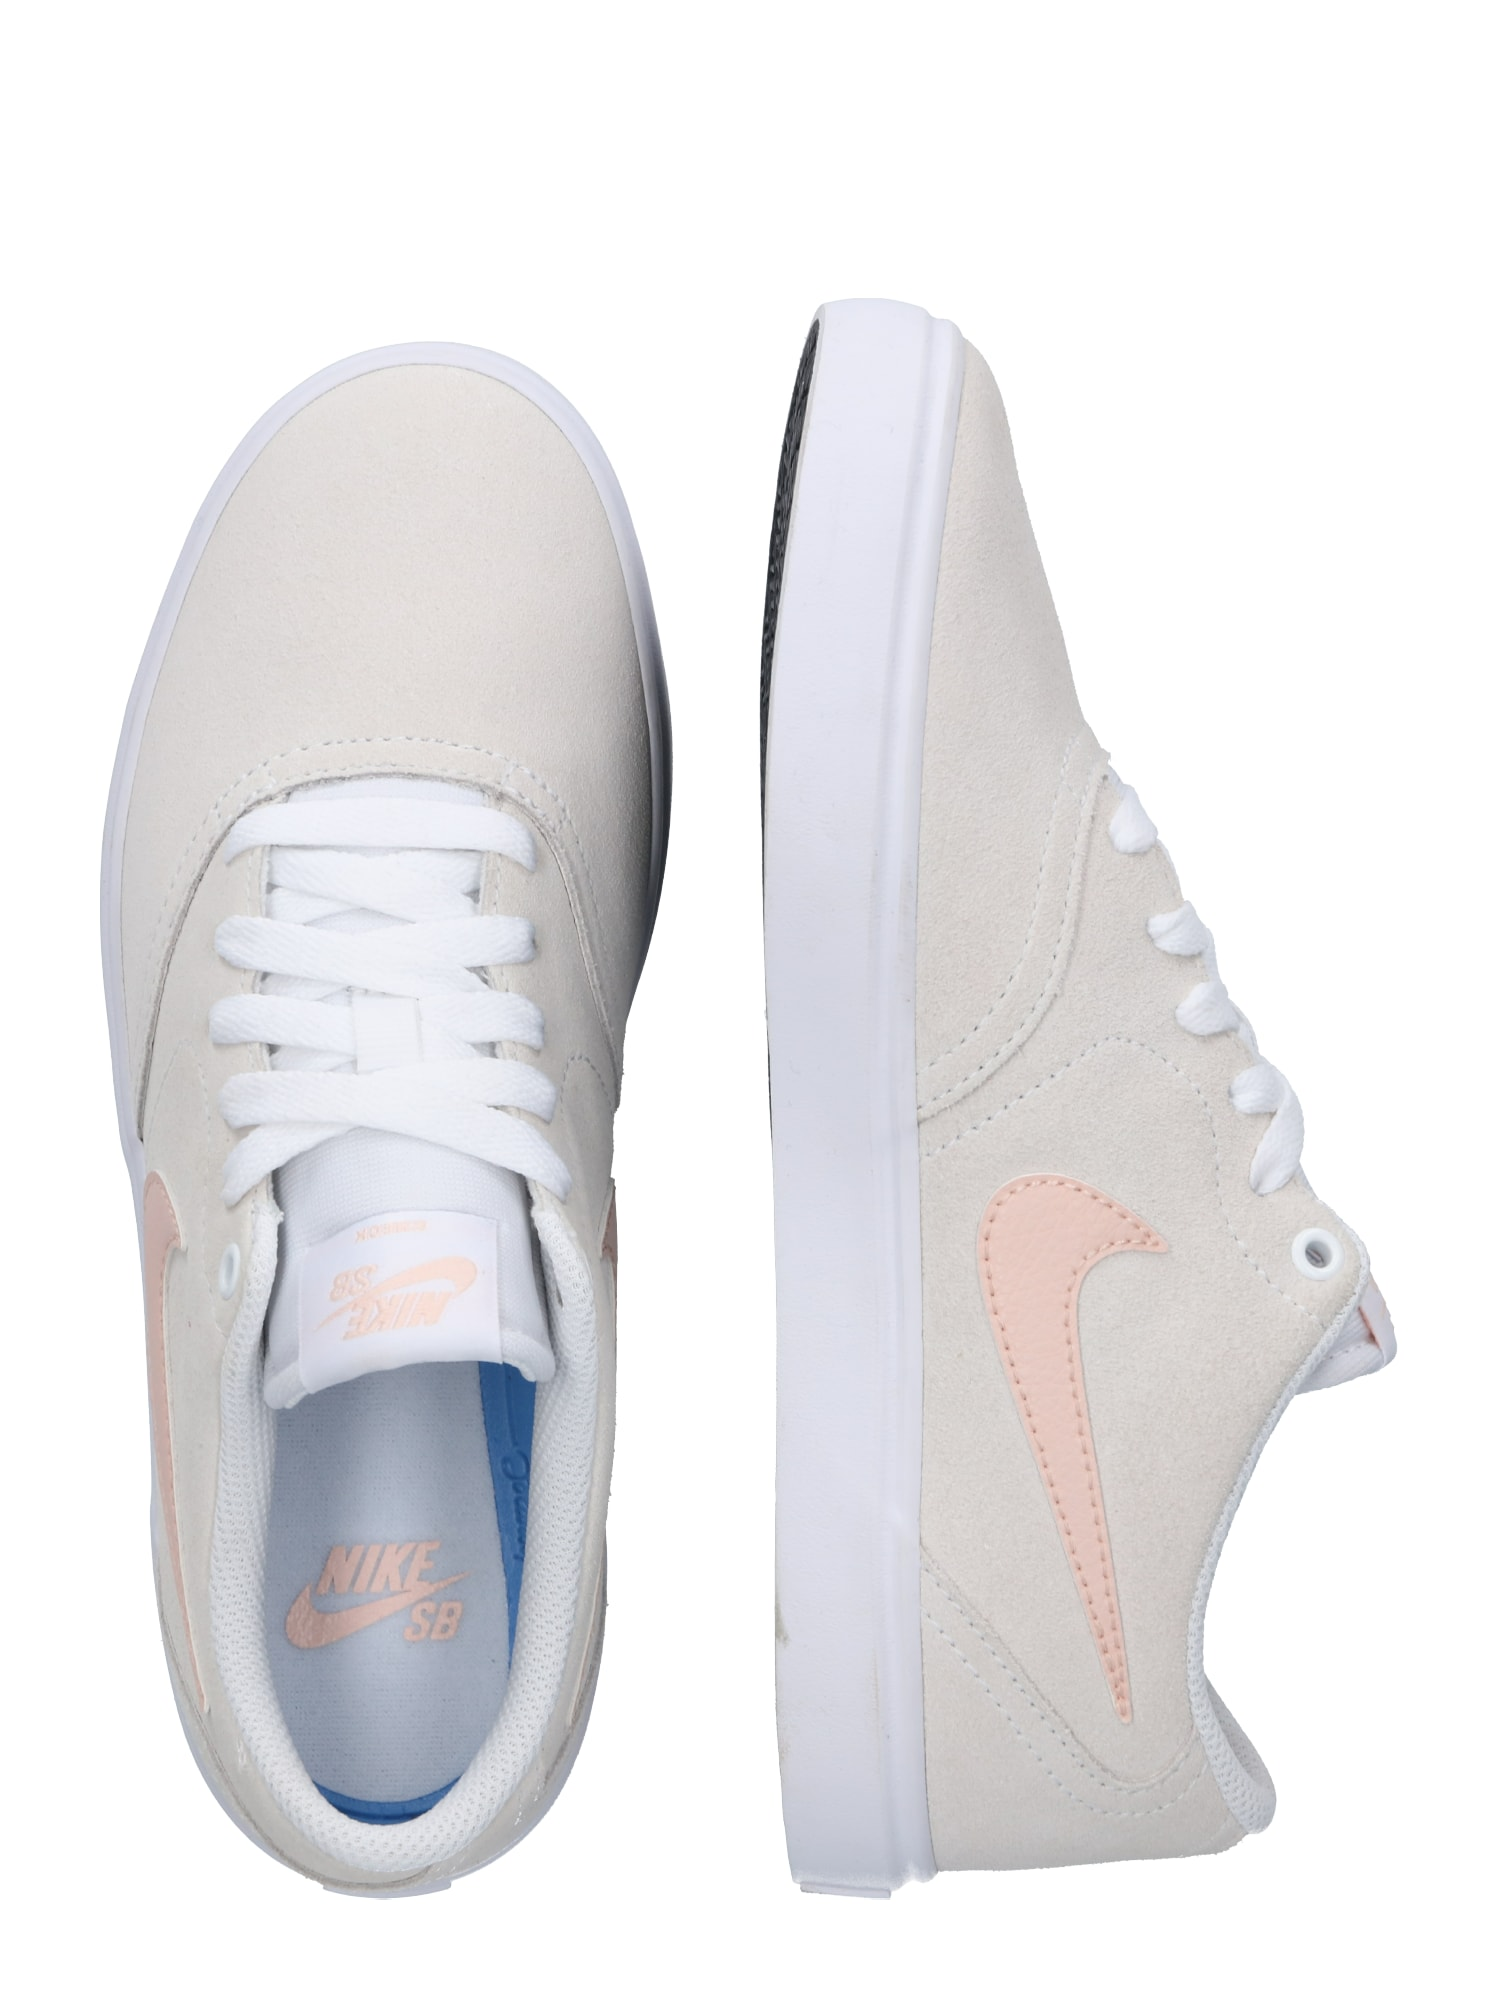 Nike SB, Damen Sneakers laag Check Solar, koraal / offwhite